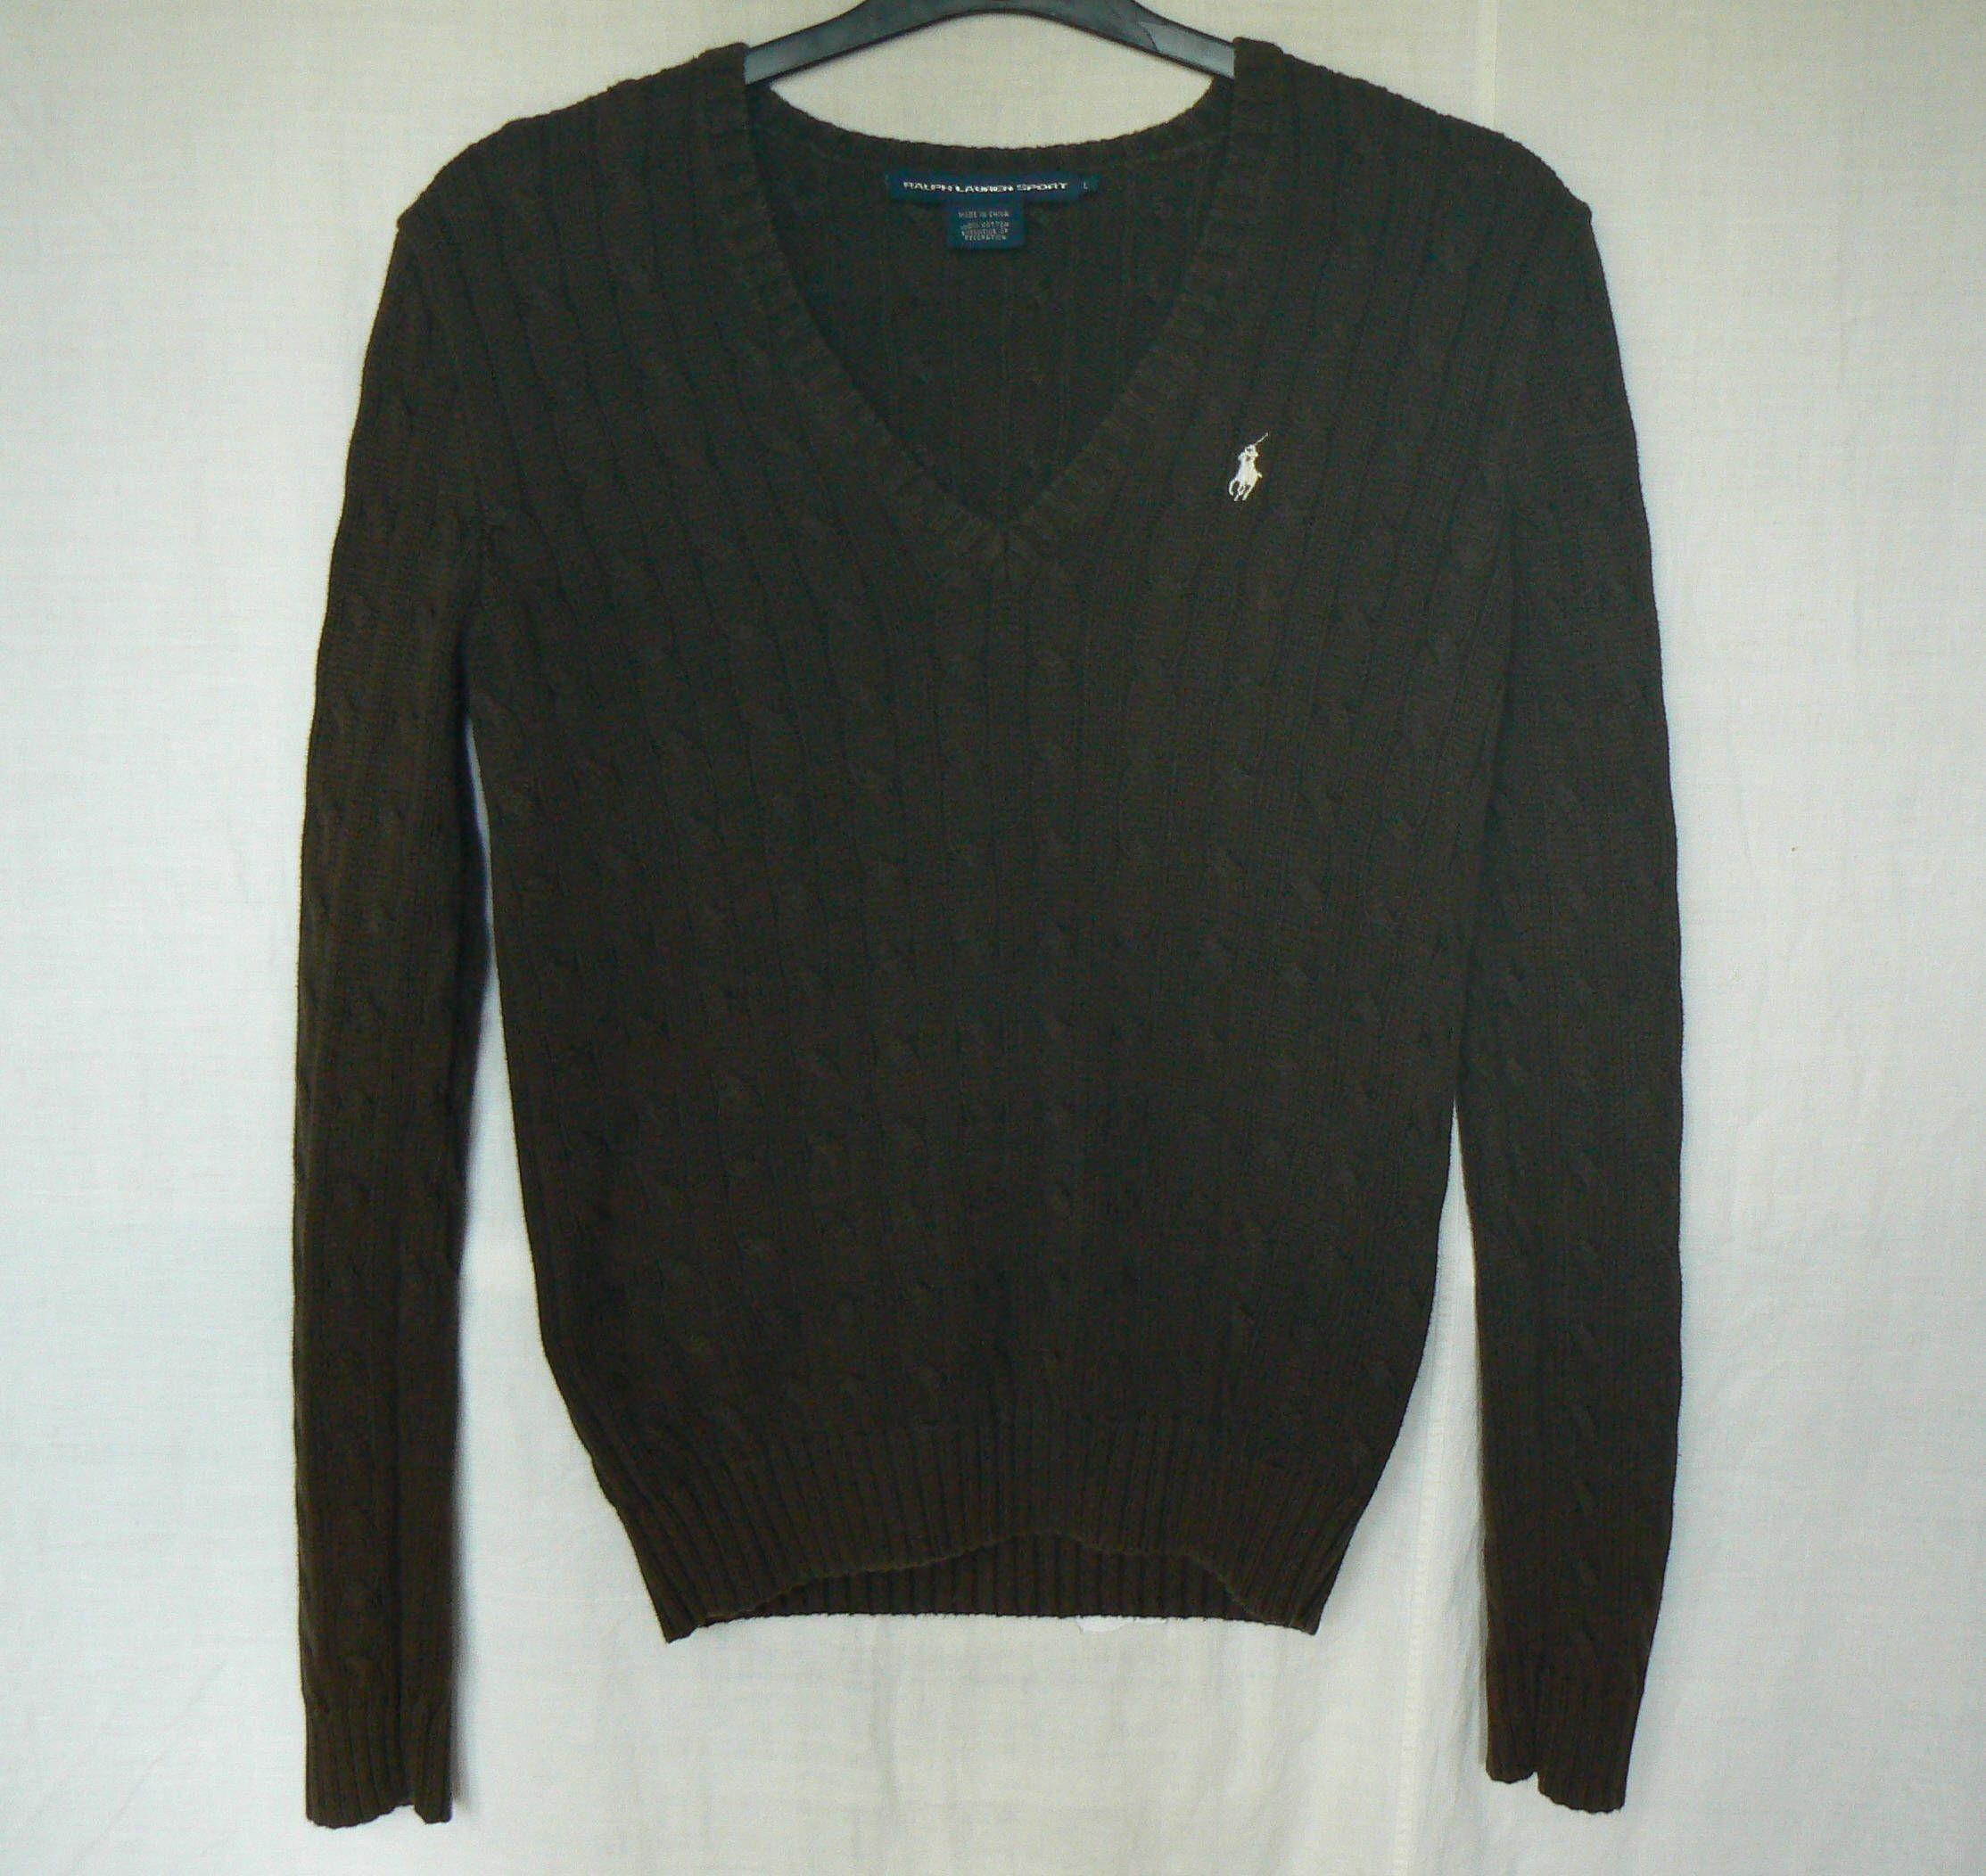 Ralph Lauren Sport Mens Brown 100% Cotton V-Neck Sweater Jumper ...